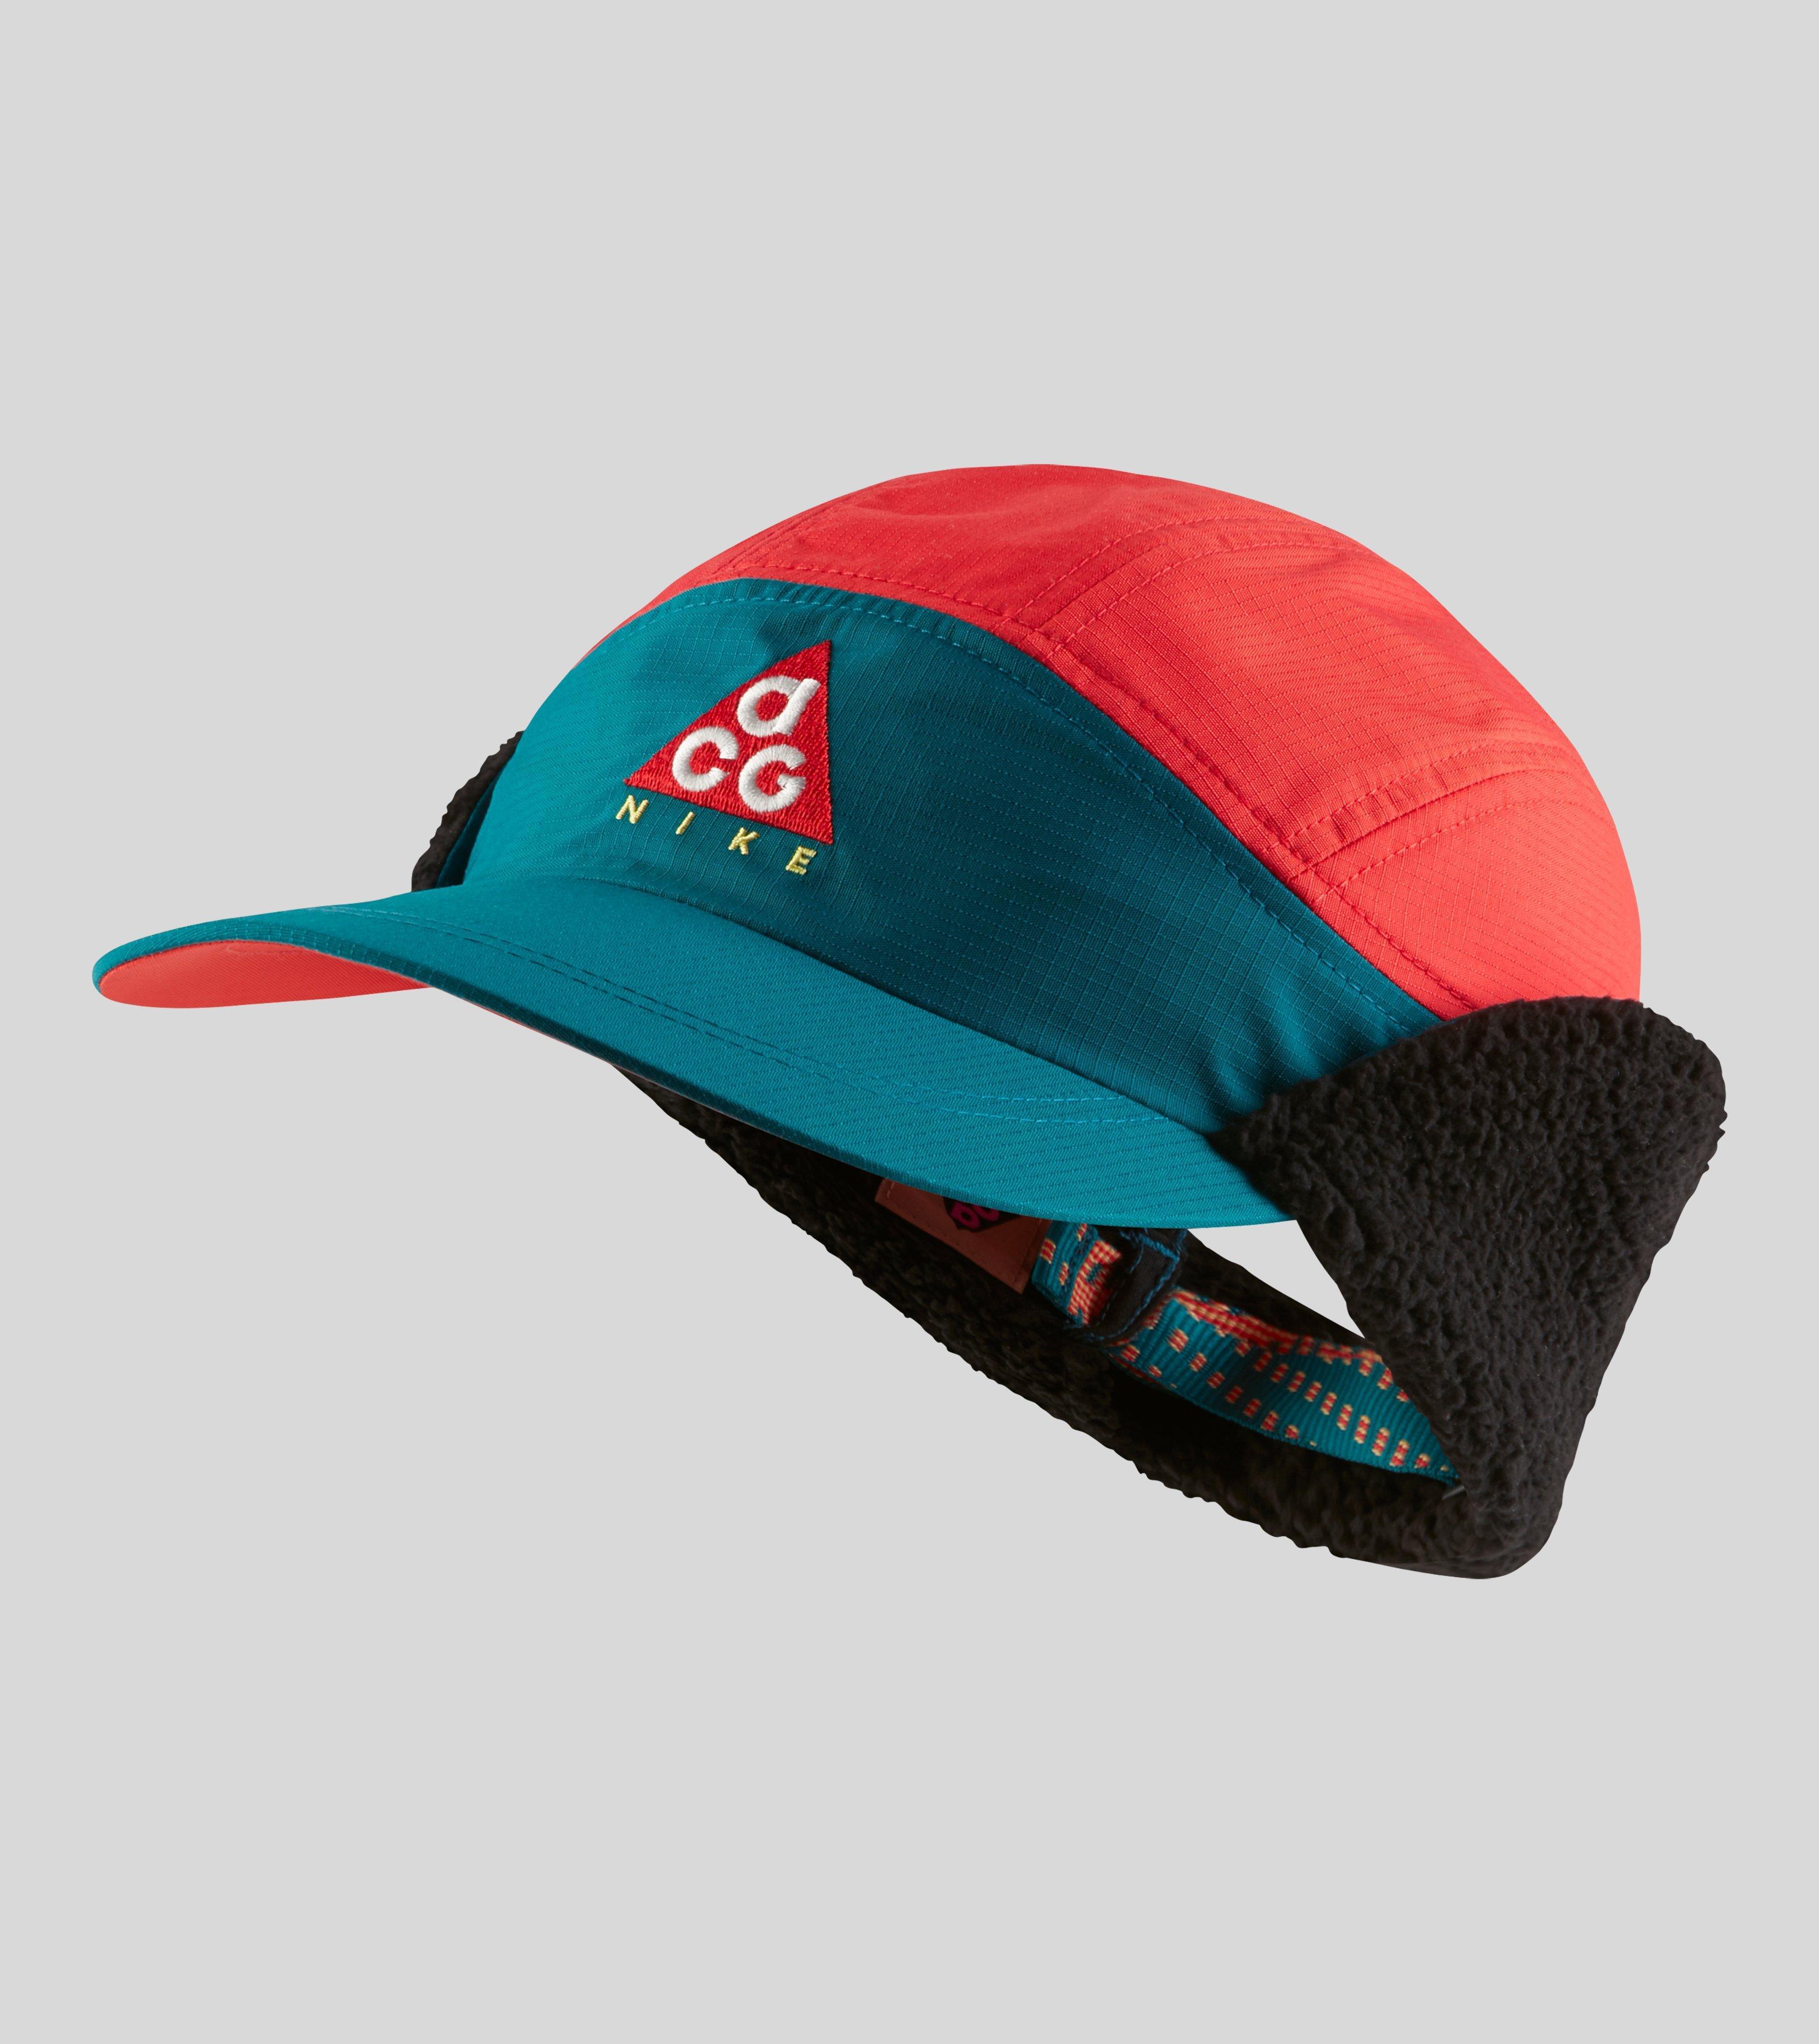 7206c119bd72c Nike Acg Tailwind Cap in Black for Men - Lyst